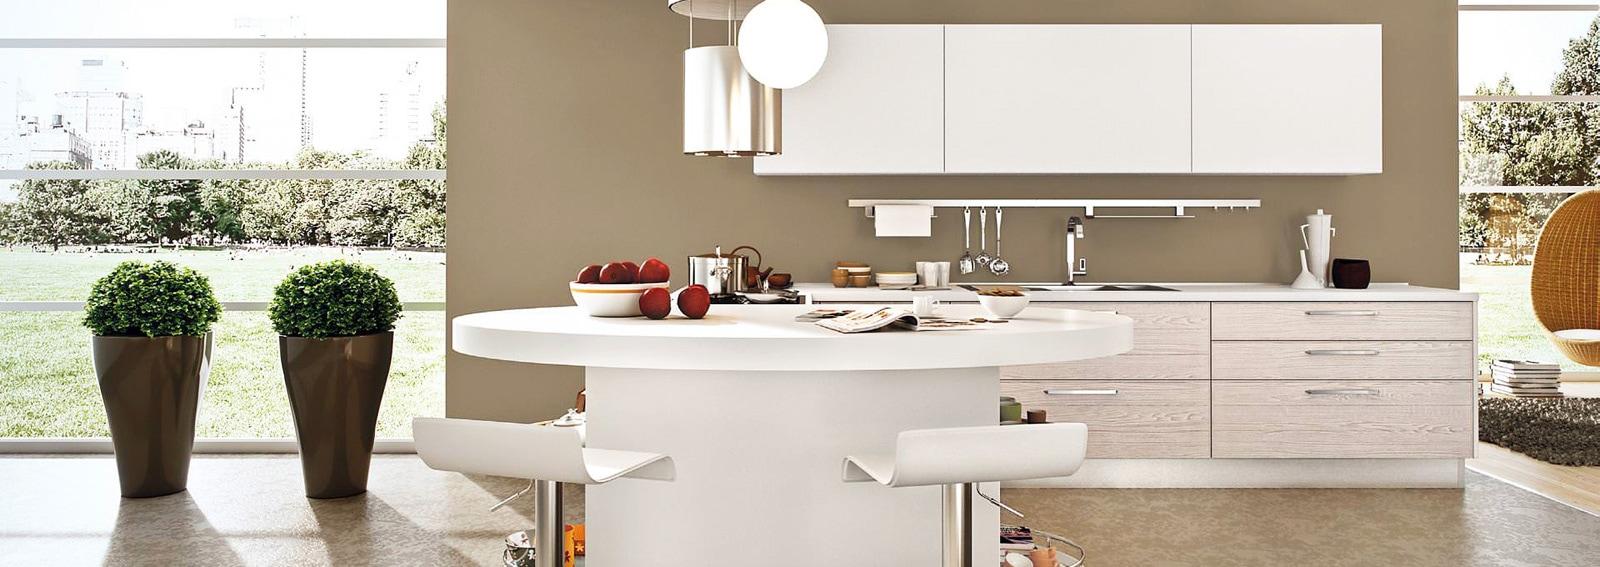 Cucine lube lanciano